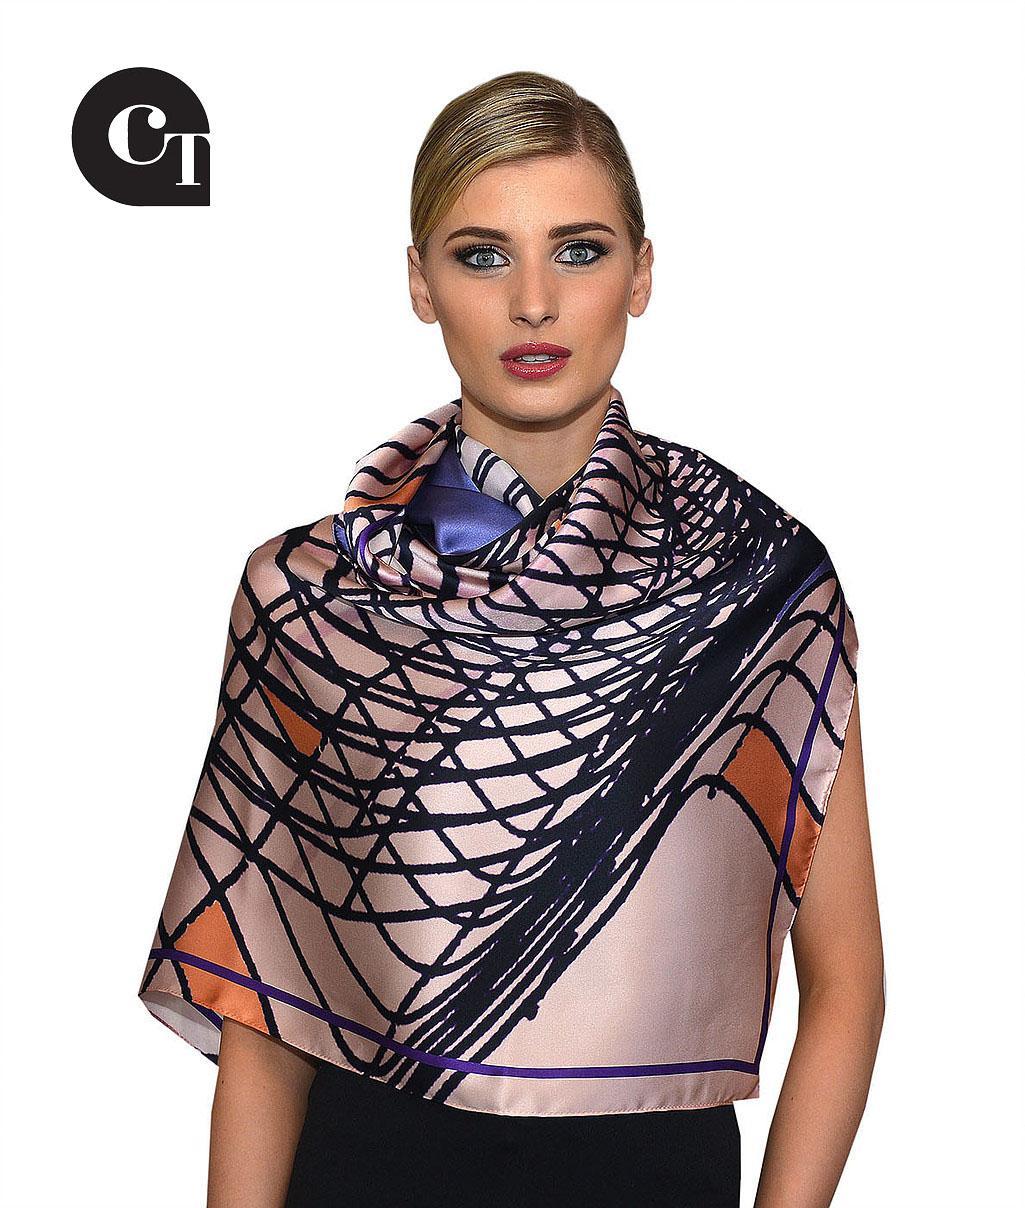 Interview with Irish Designer Claudia Taheny